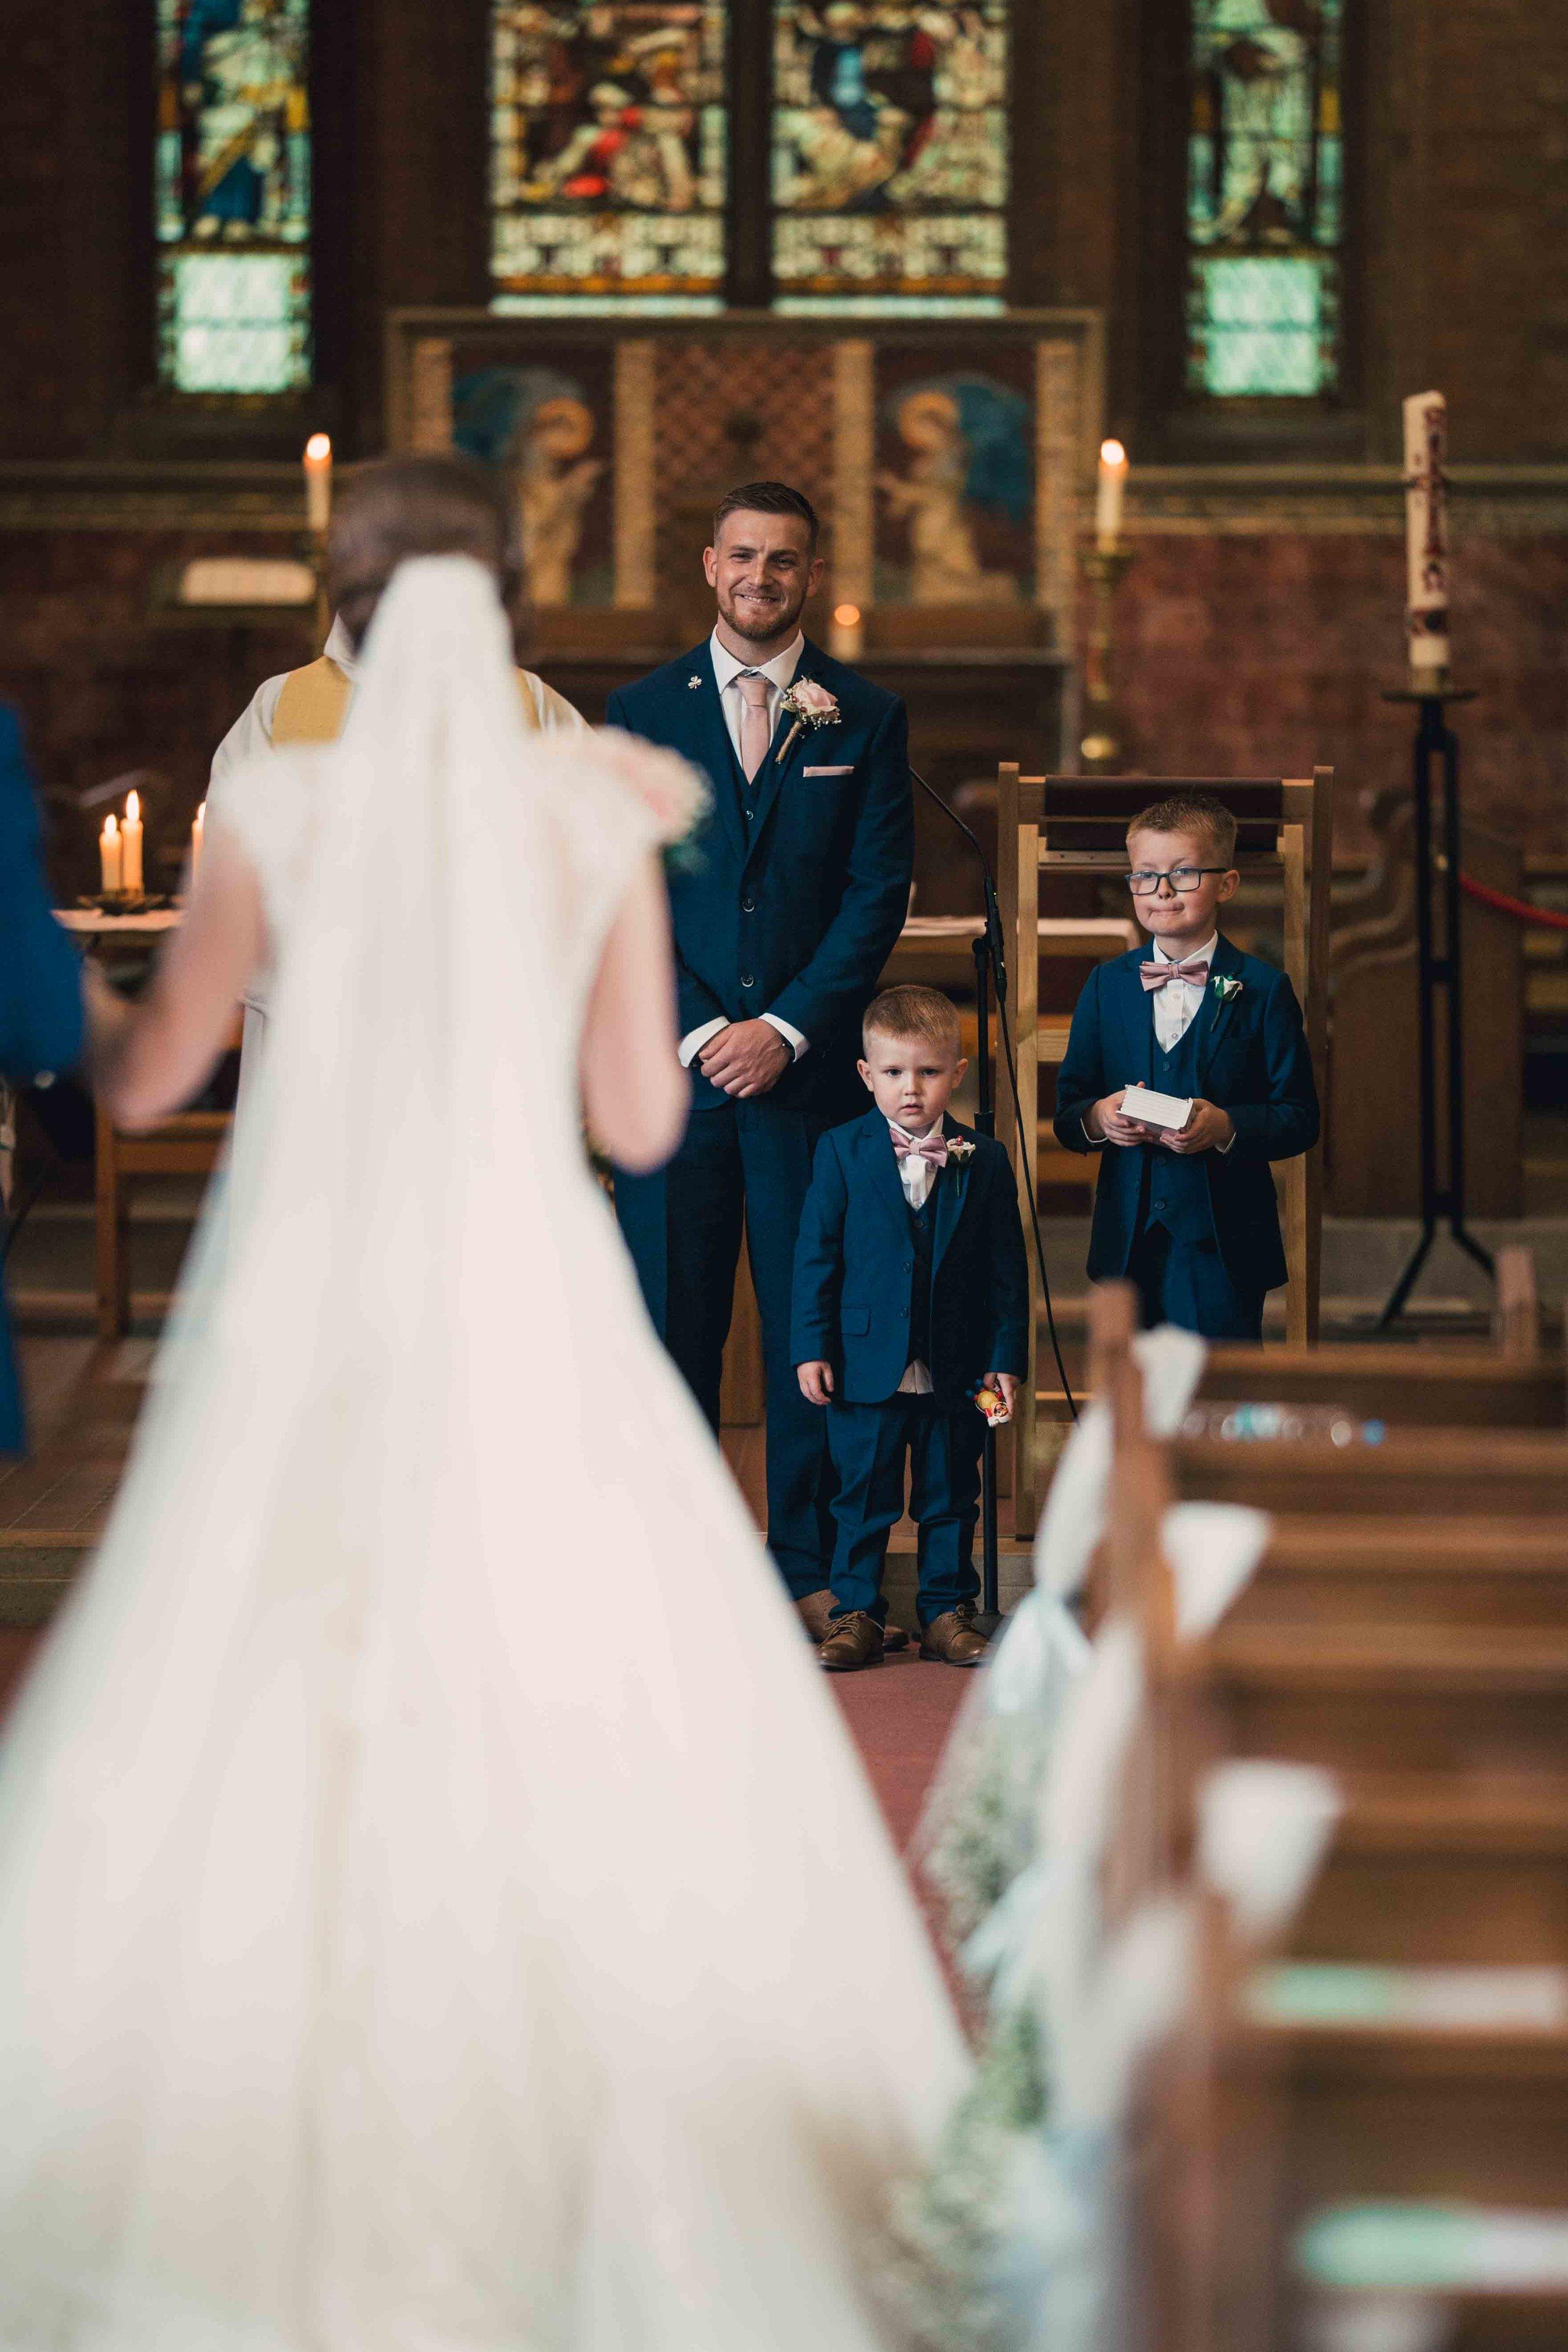 Lea-cooper-photography-willenhall-wolverhampton-wedding-photographer-birmingham-shirley-west-midlands-ceremony-church-20.JPG